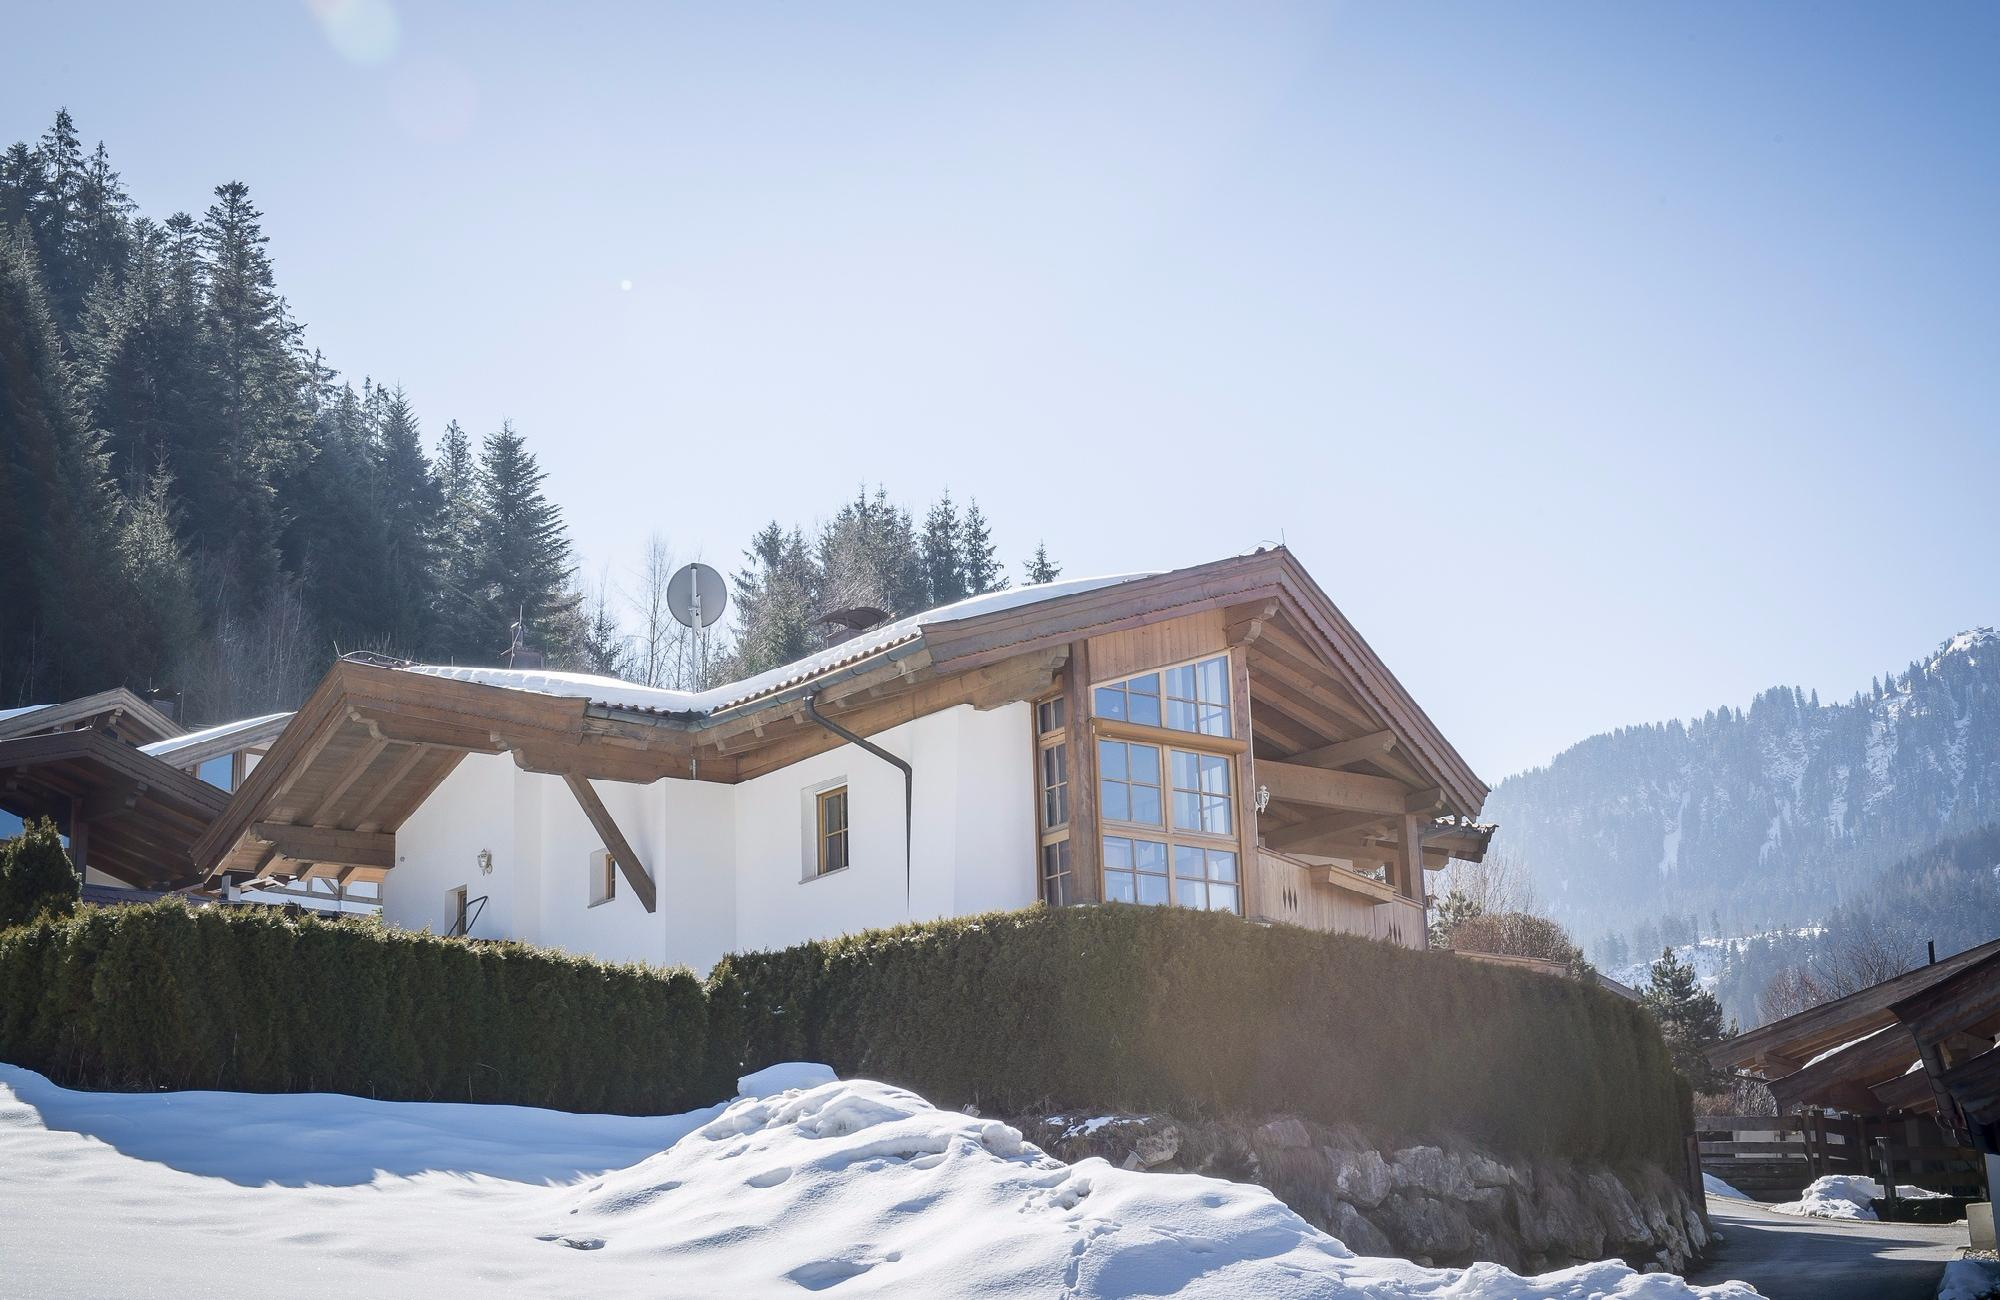 Immobilien - Traditionelles Landhaus in der Nähe des Kitzbüheler Schwarzsees, Kitzbuehel